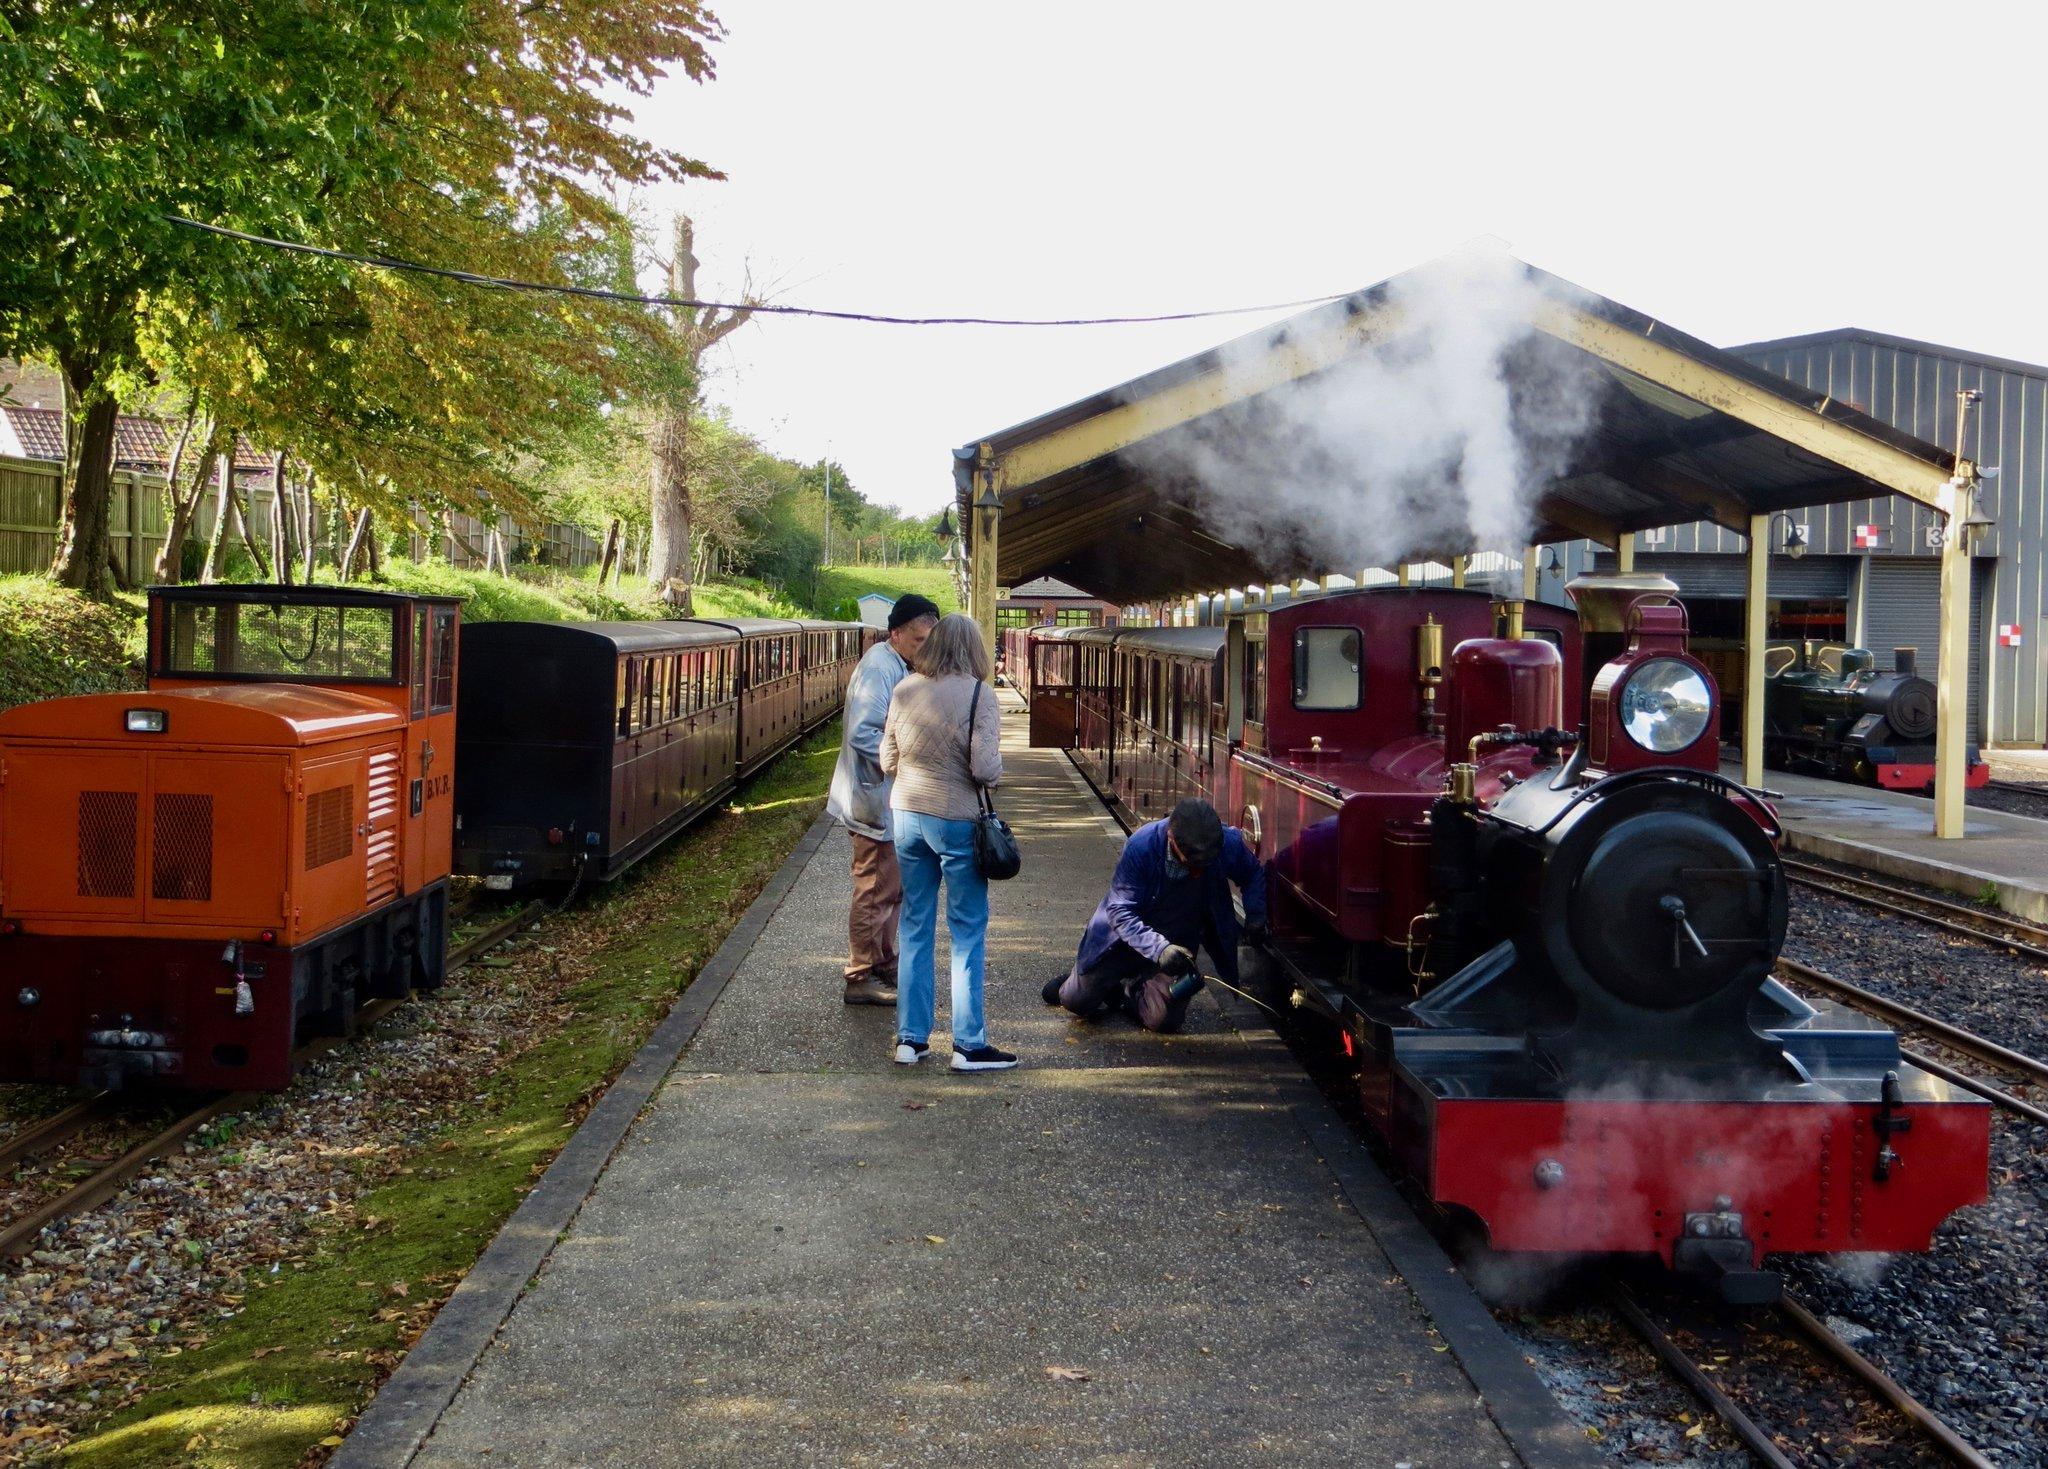 EVBe YiXYAU1Hcw?format=jpg&name=large - The Bure Valley Railway